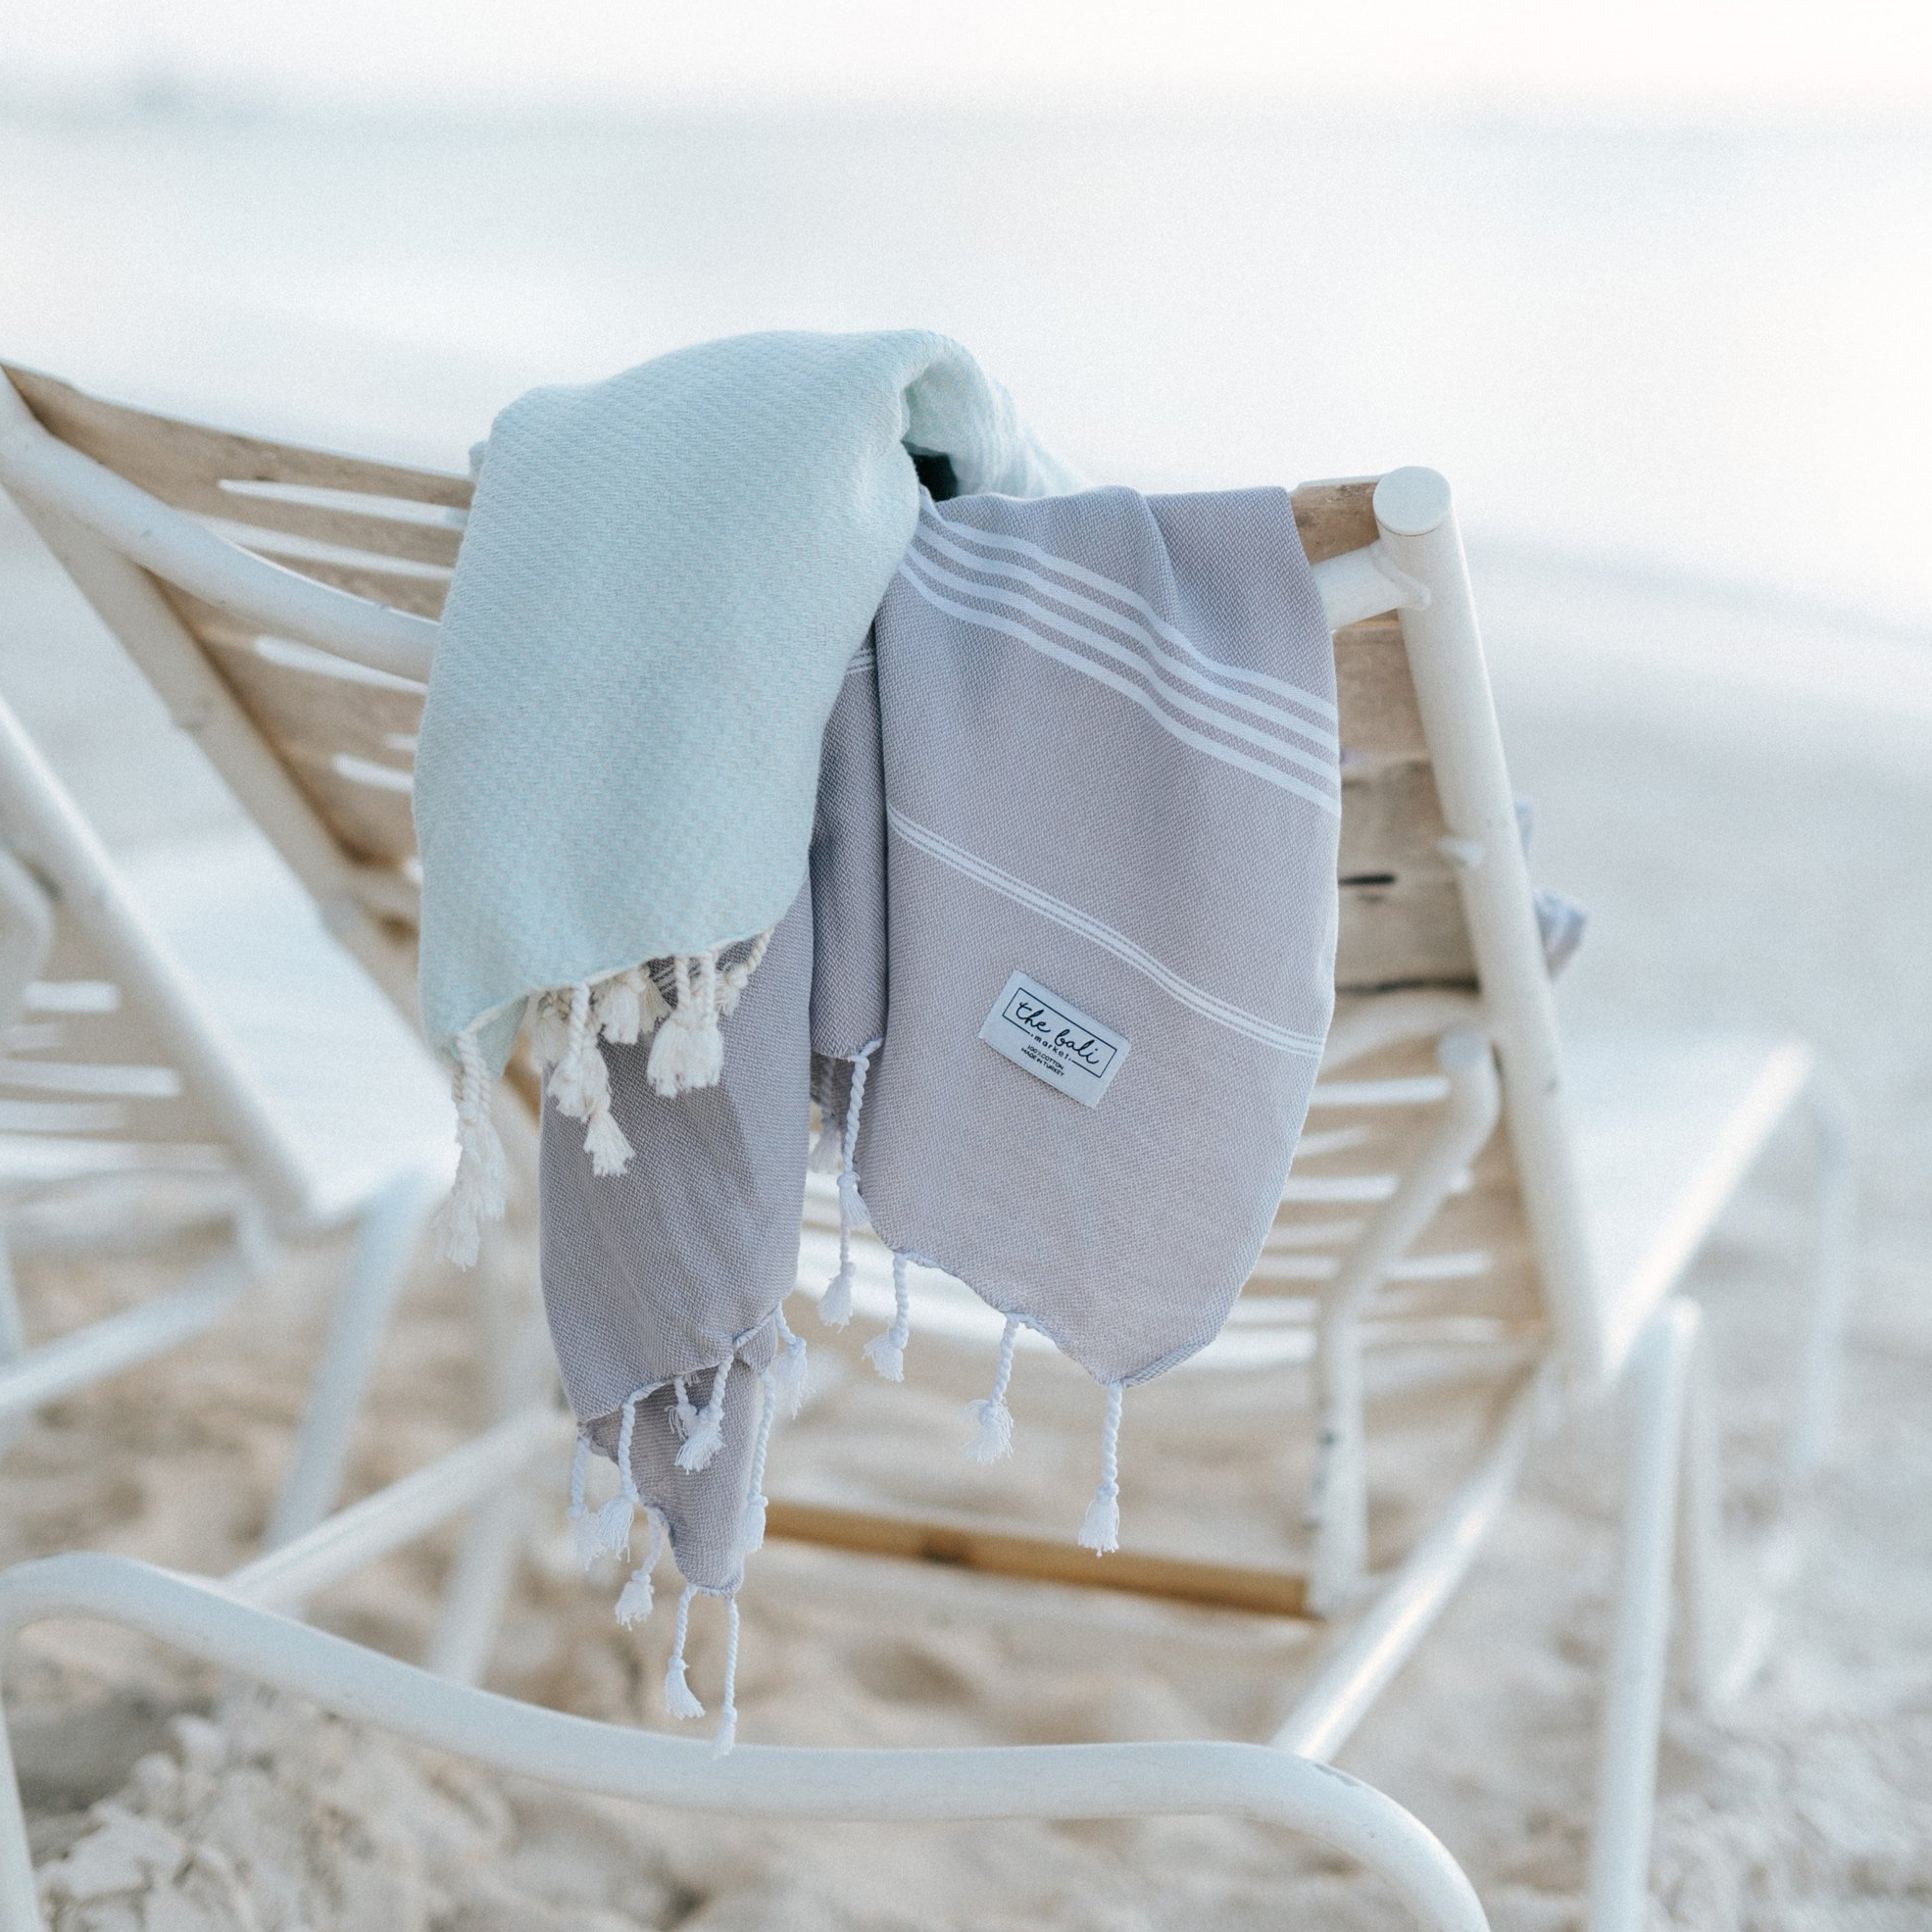 Bali_Market_Aruba-towel.jpg?mtime=20180619110729#asset:102173